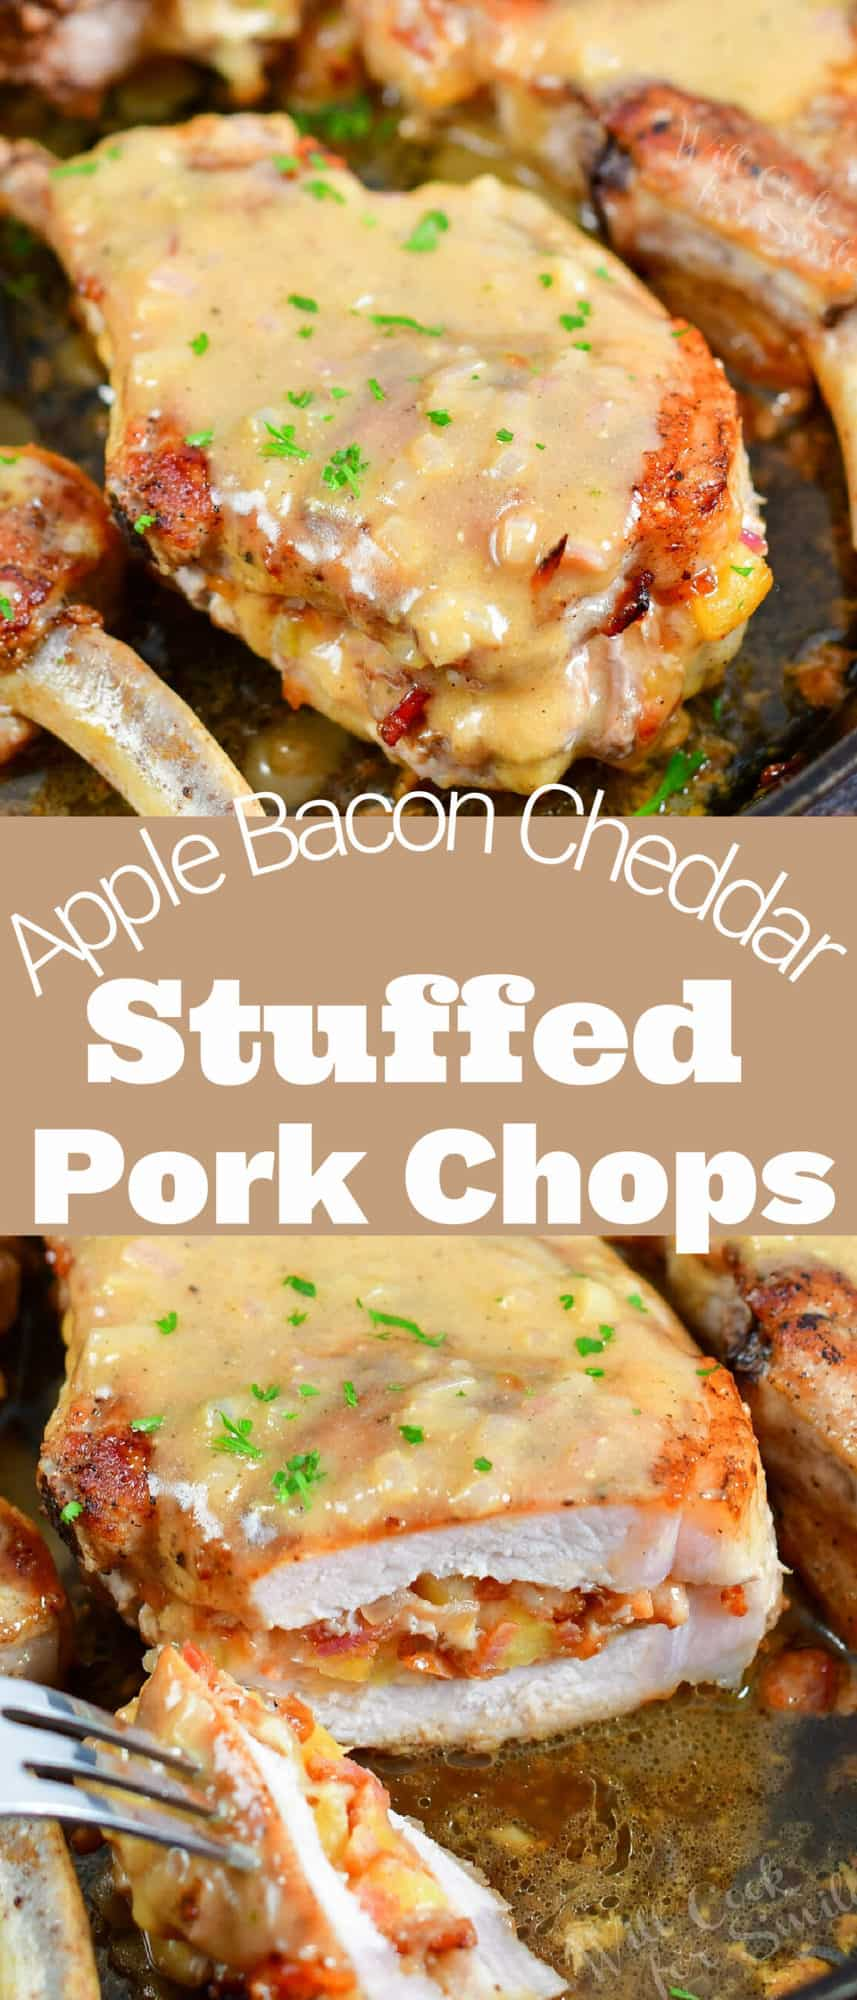 collage of closeup stuffed pork chop with sauce and sliced stuffed pork chop